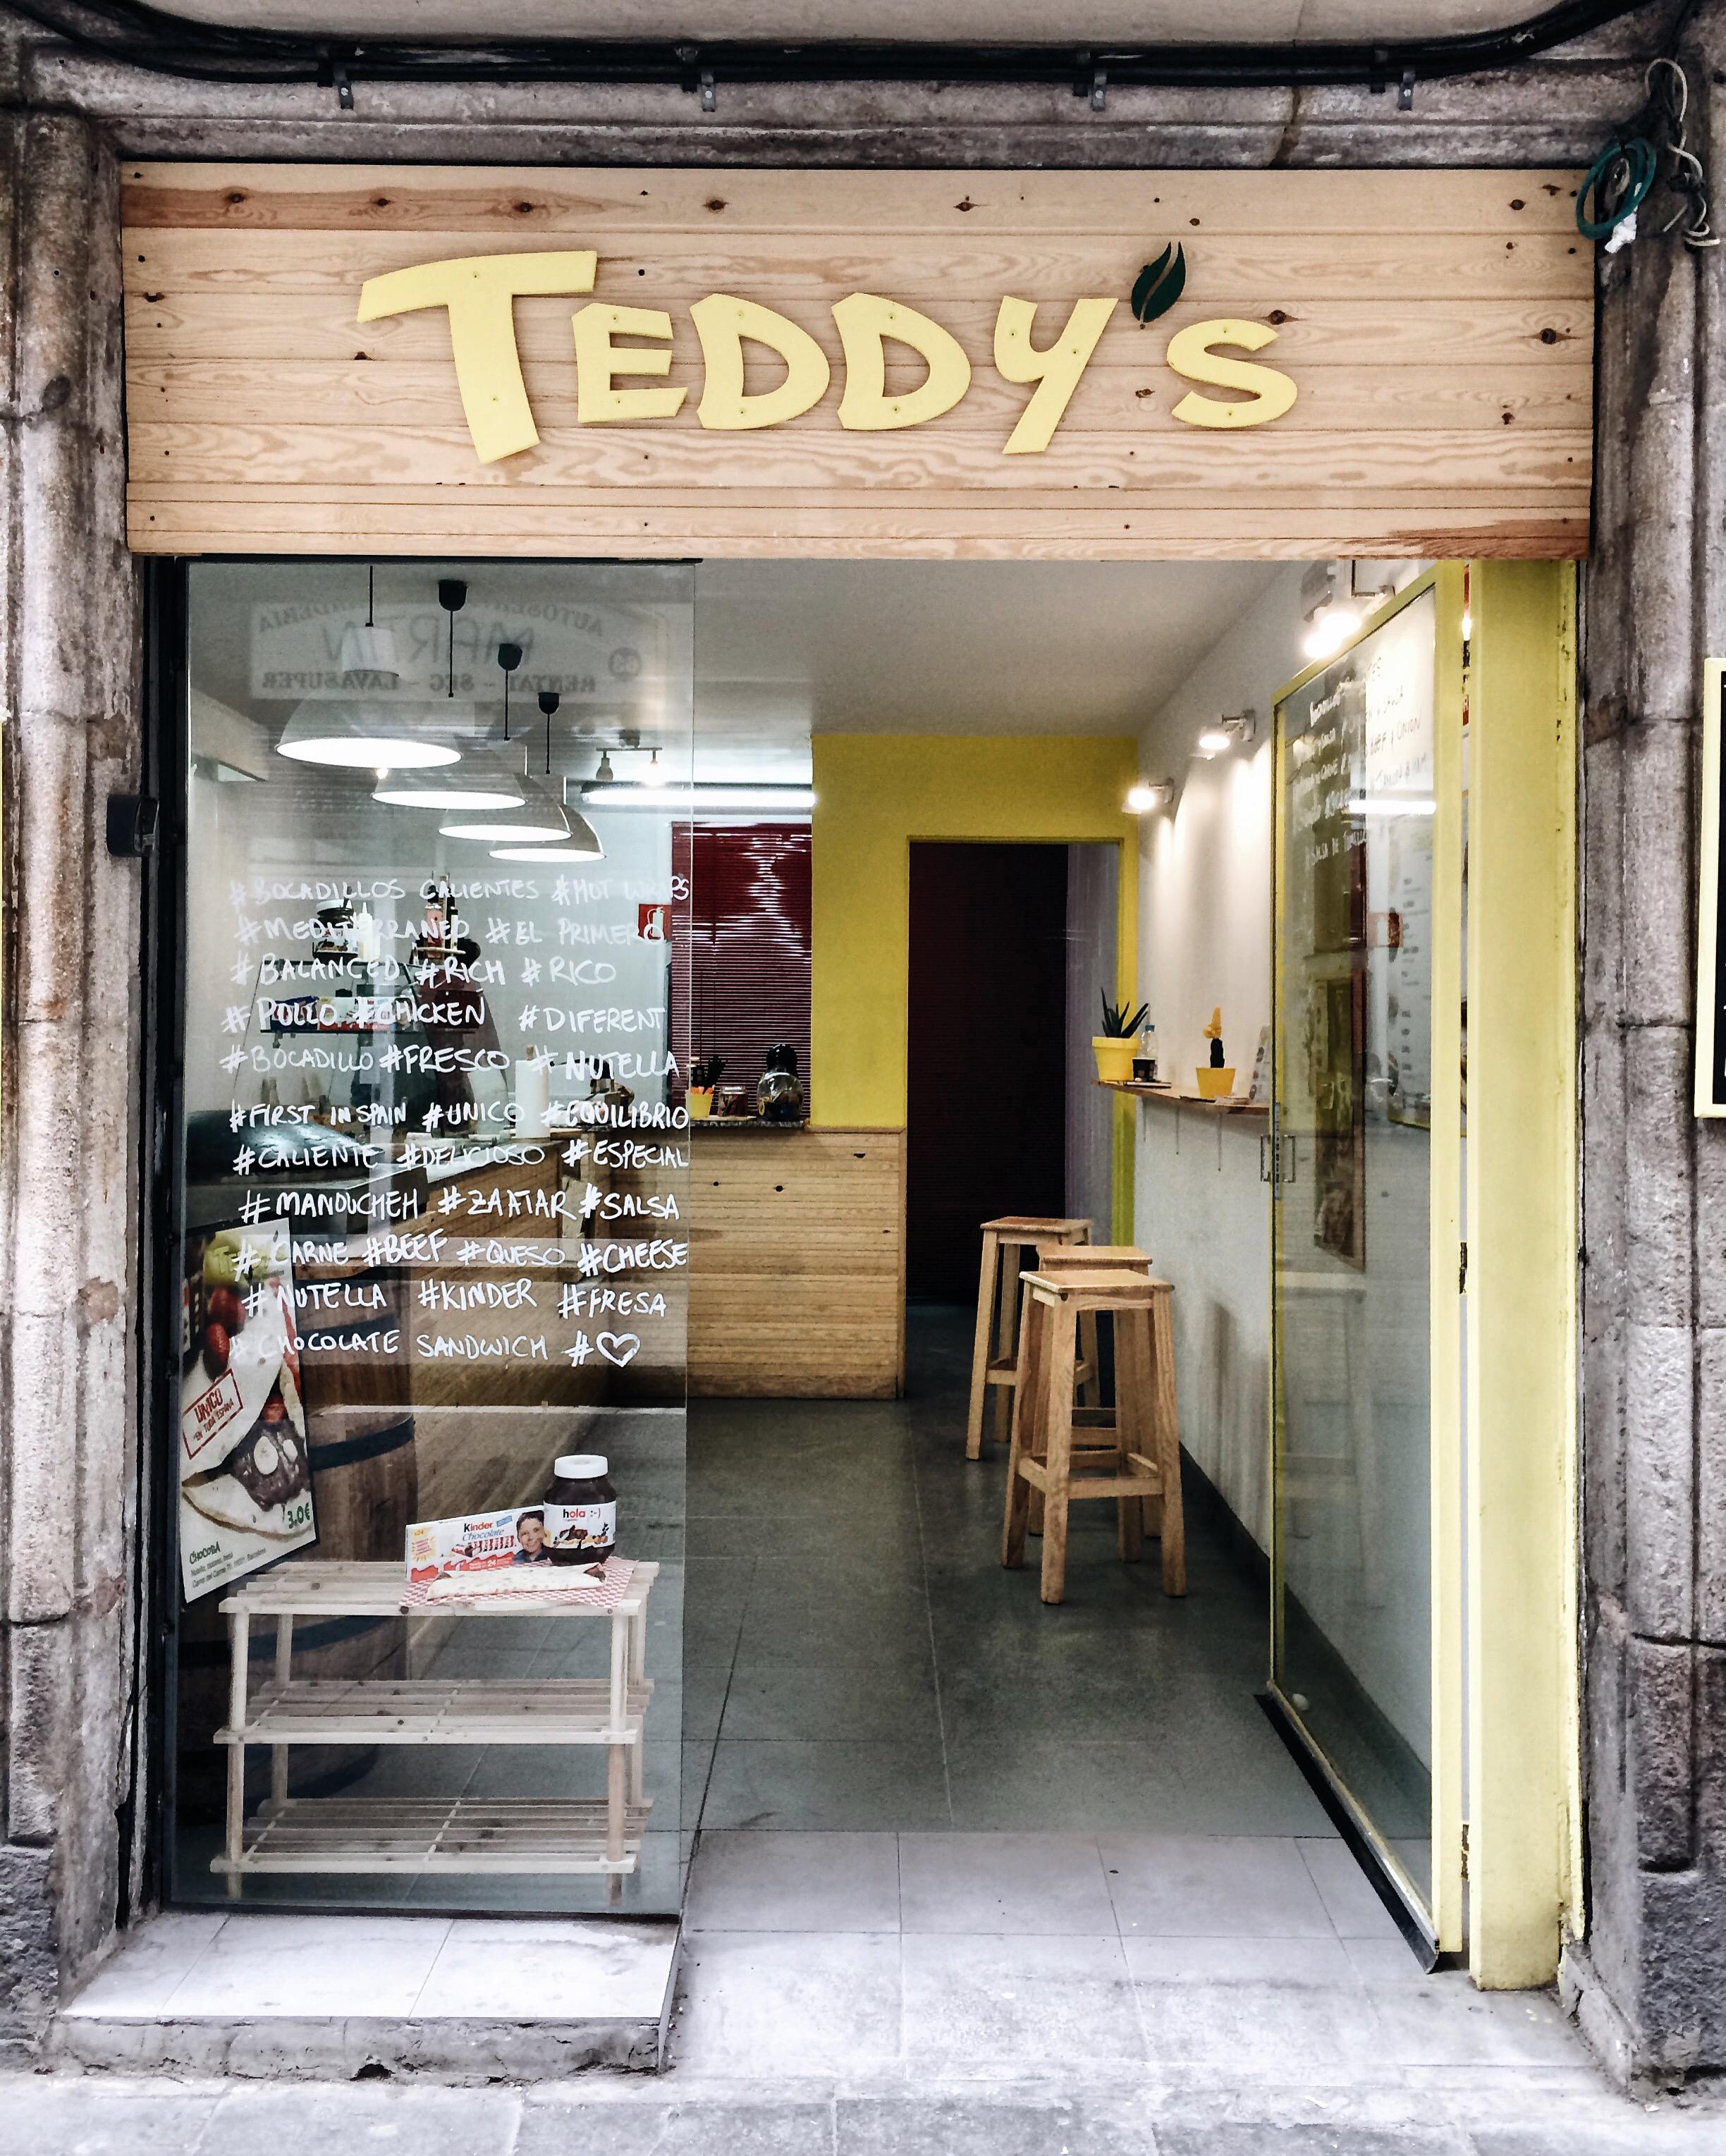 Teddy's, Barcelona